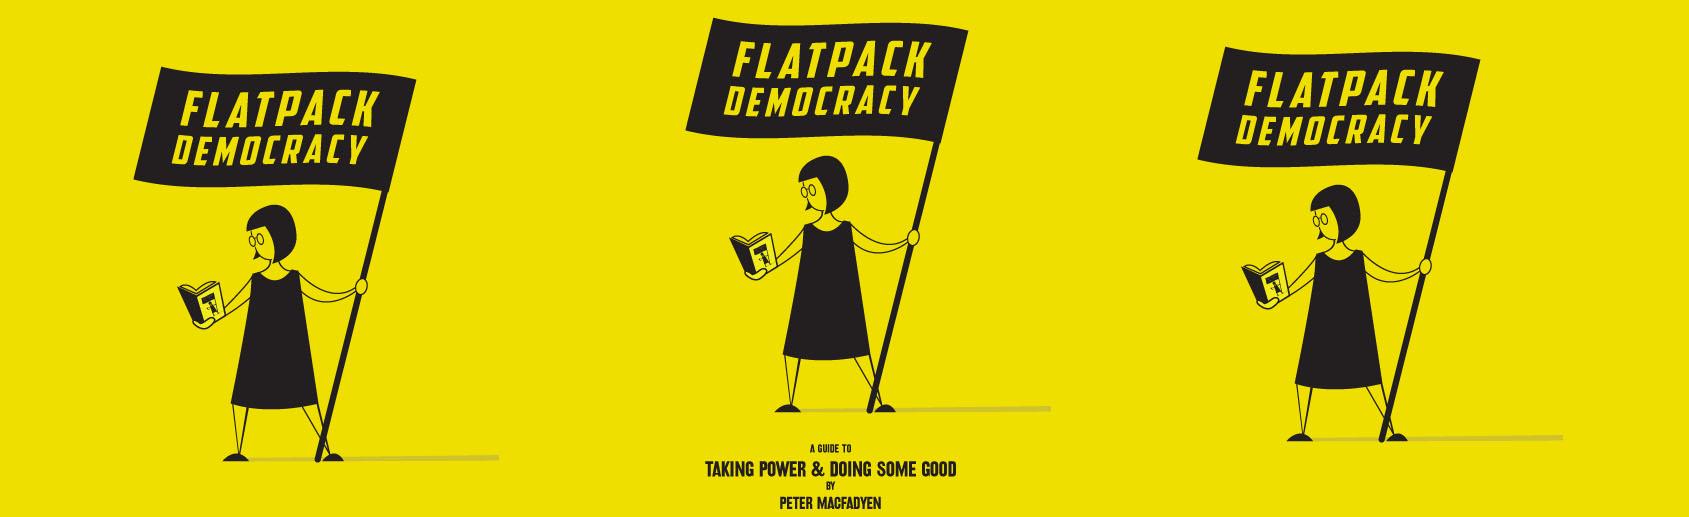 Flatpack Democracy Flyer